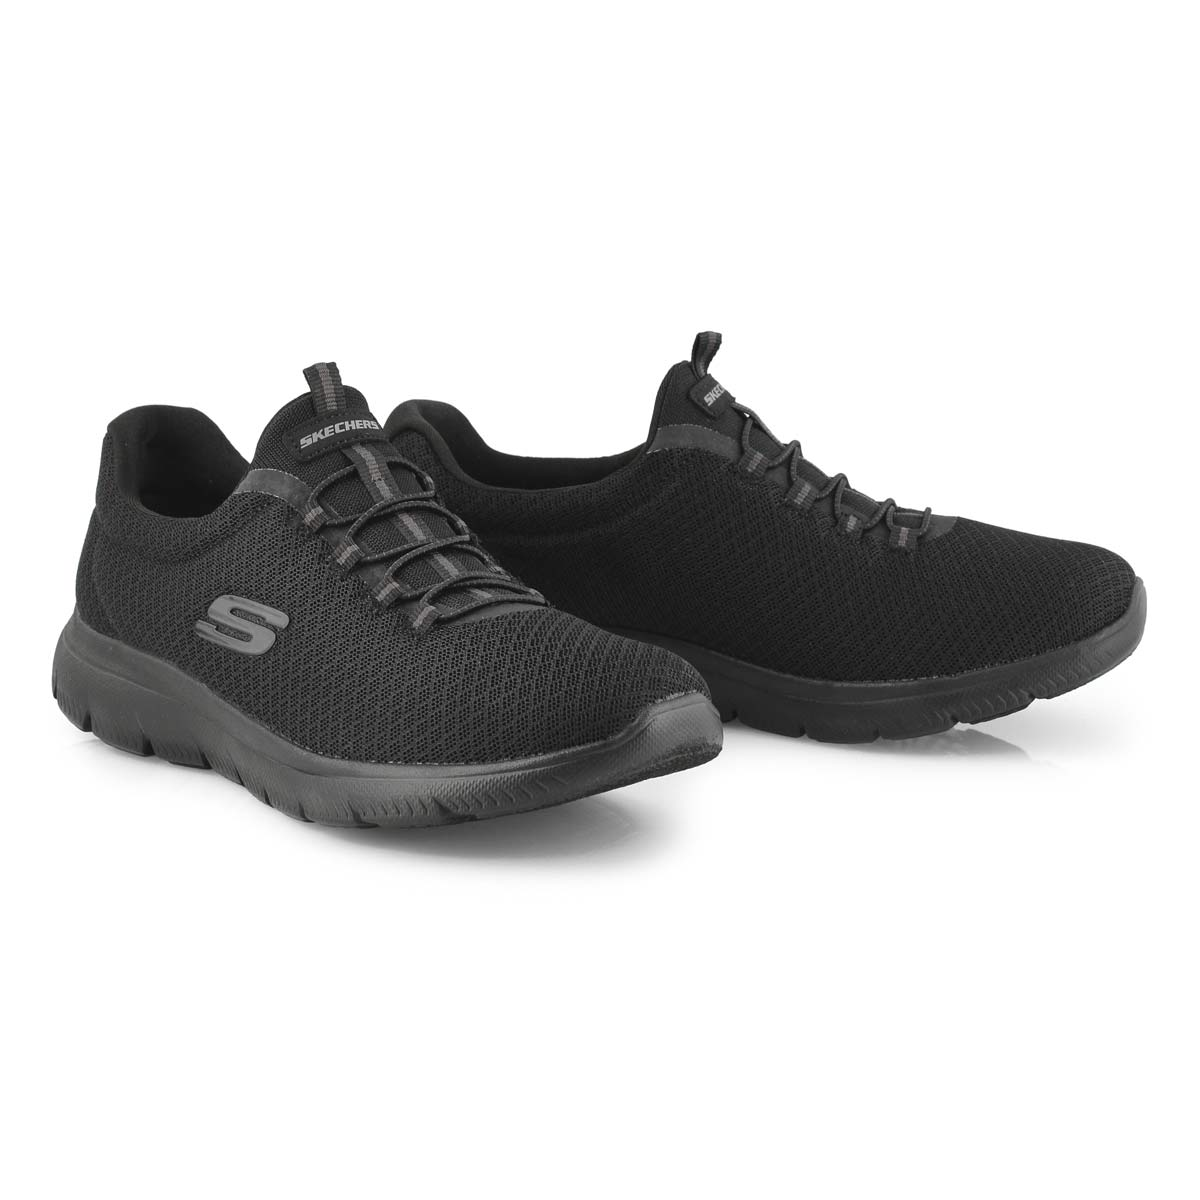 Lds Summits black slip on sneaker